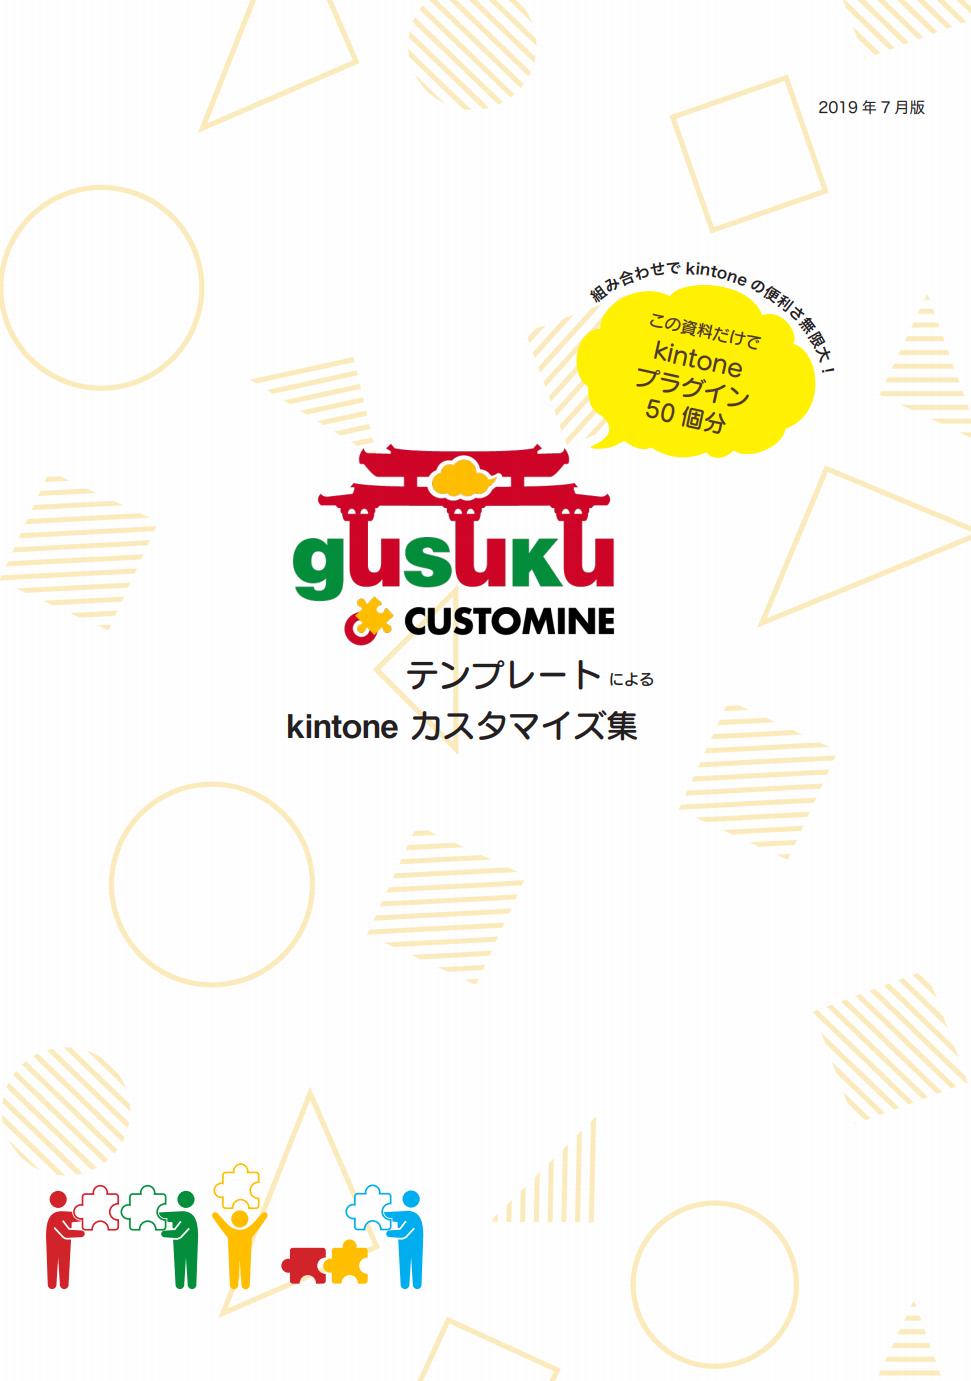 gusuku Customine テンプレートによるkintoneカスタマイズ集